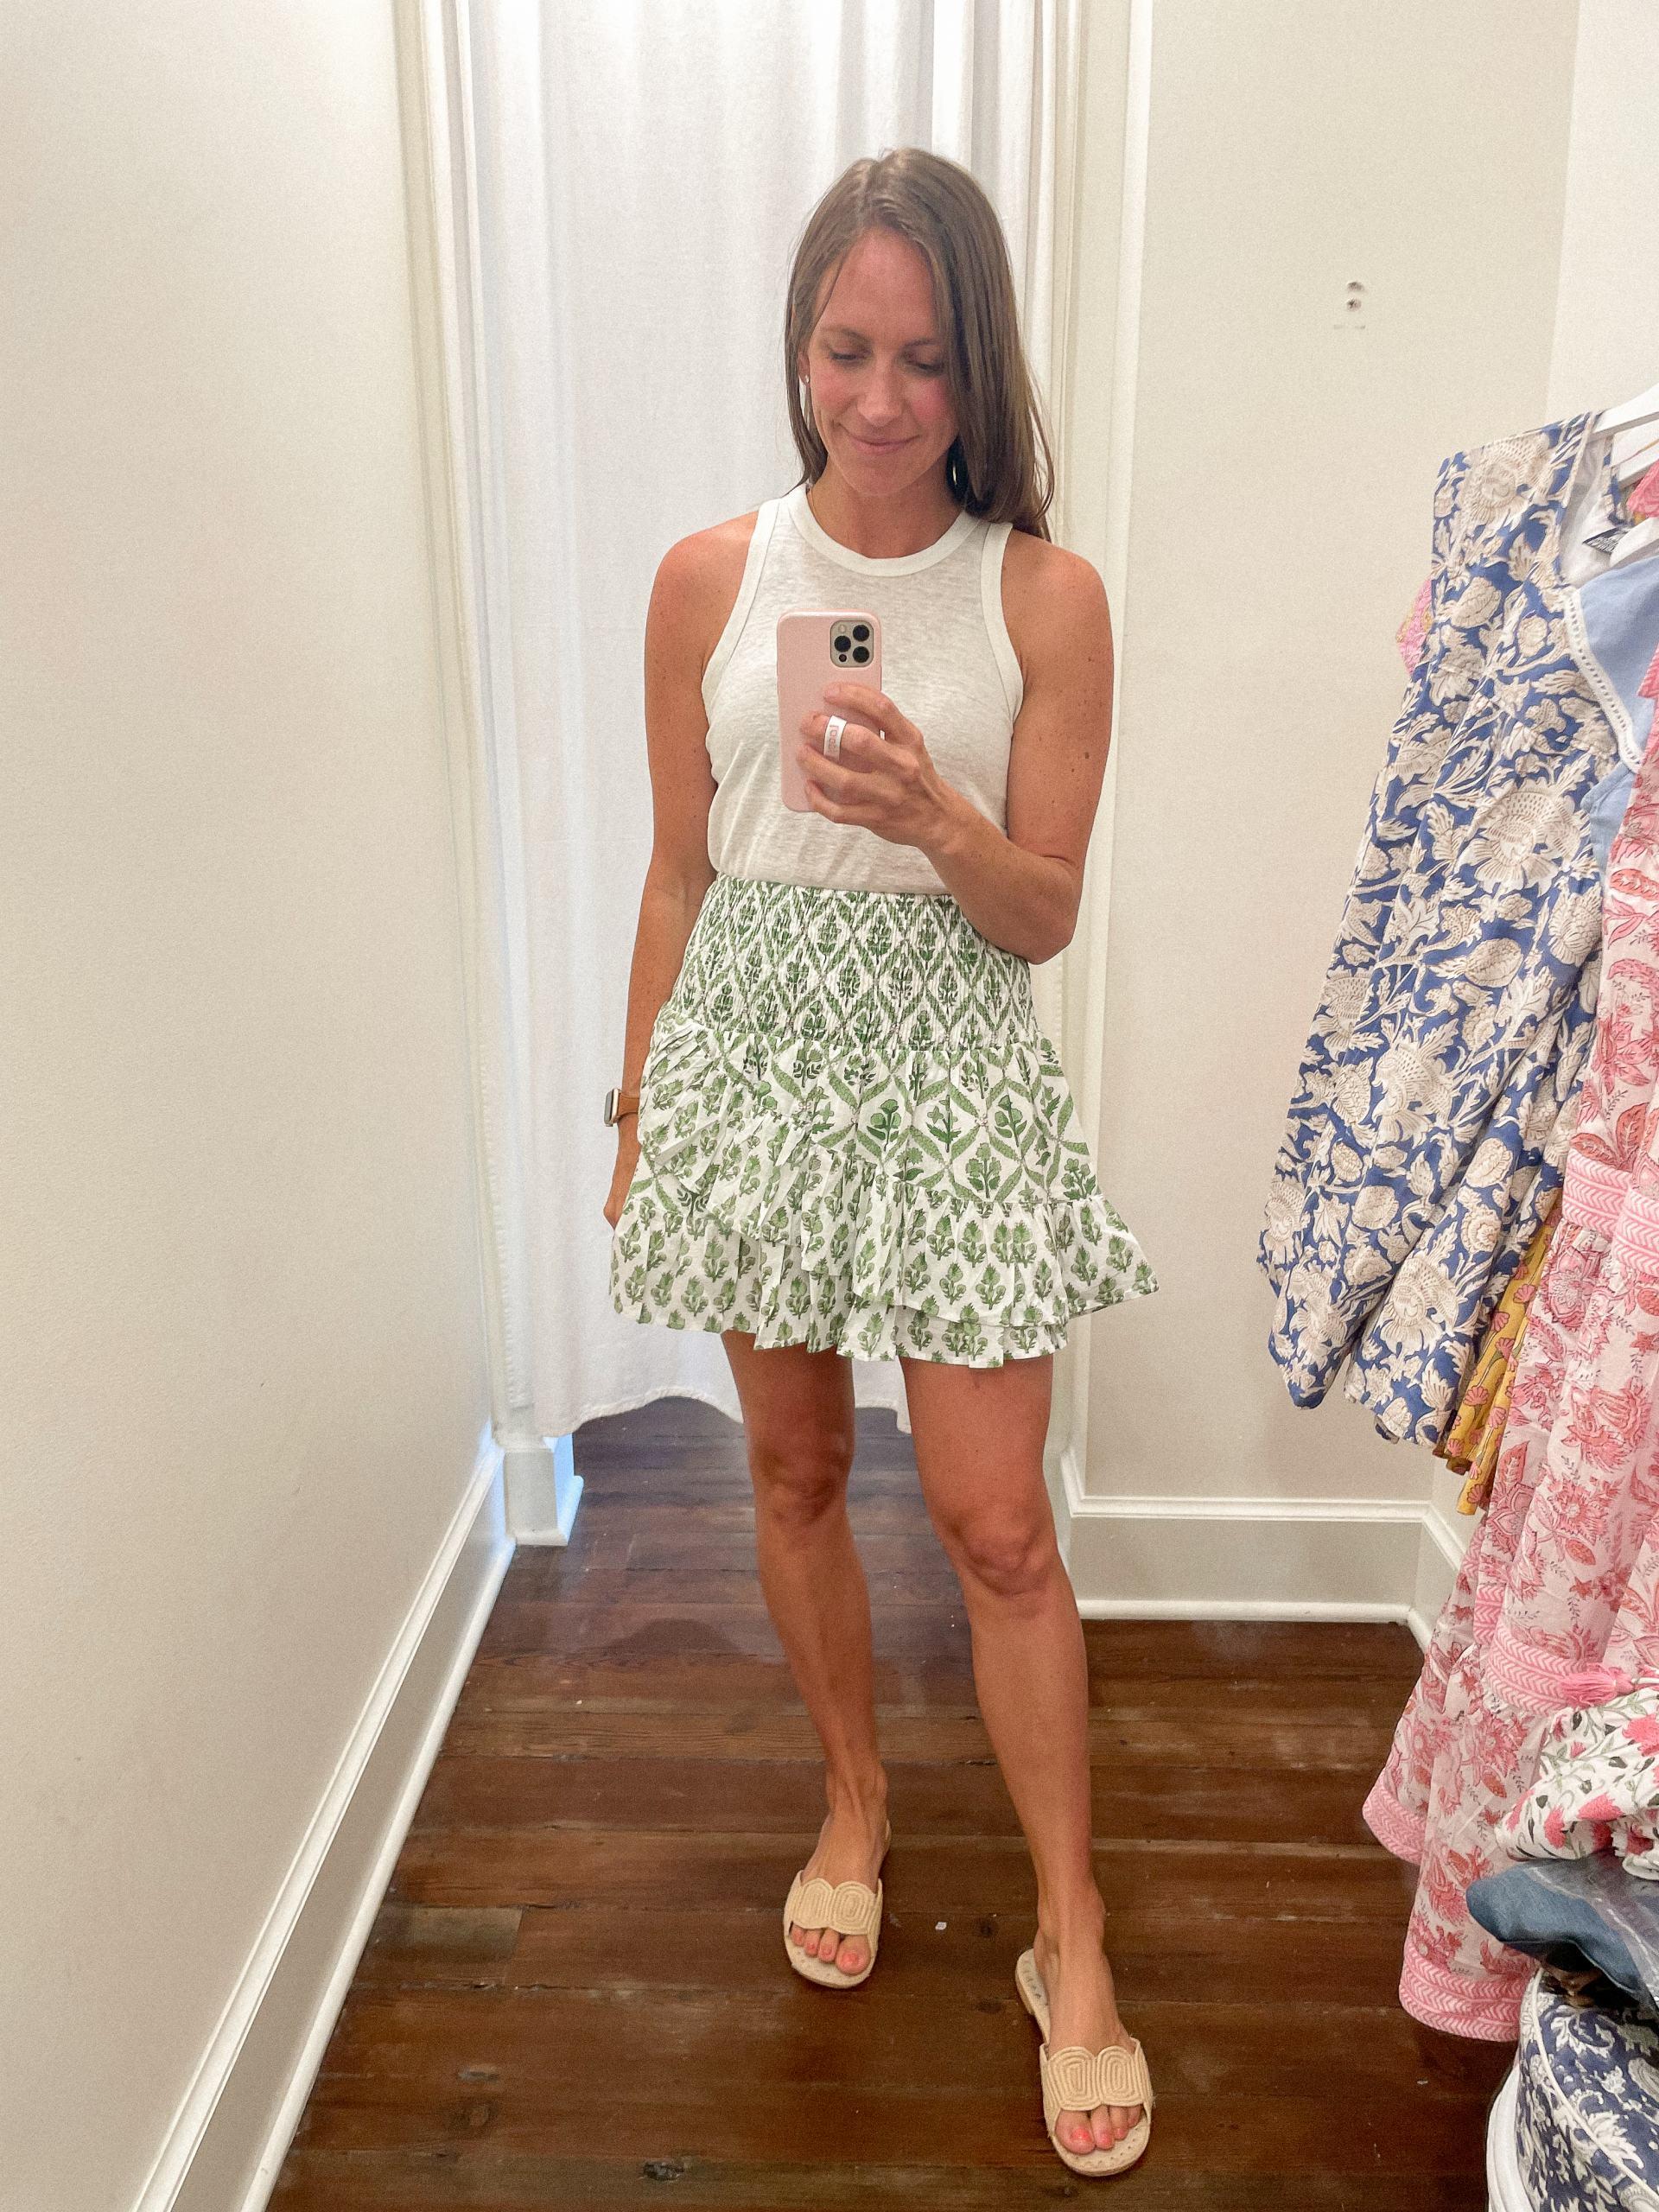 Amelia Skirt - Madison Mathews - Madison Mathews discount code - madison mathews sizing - block print dress